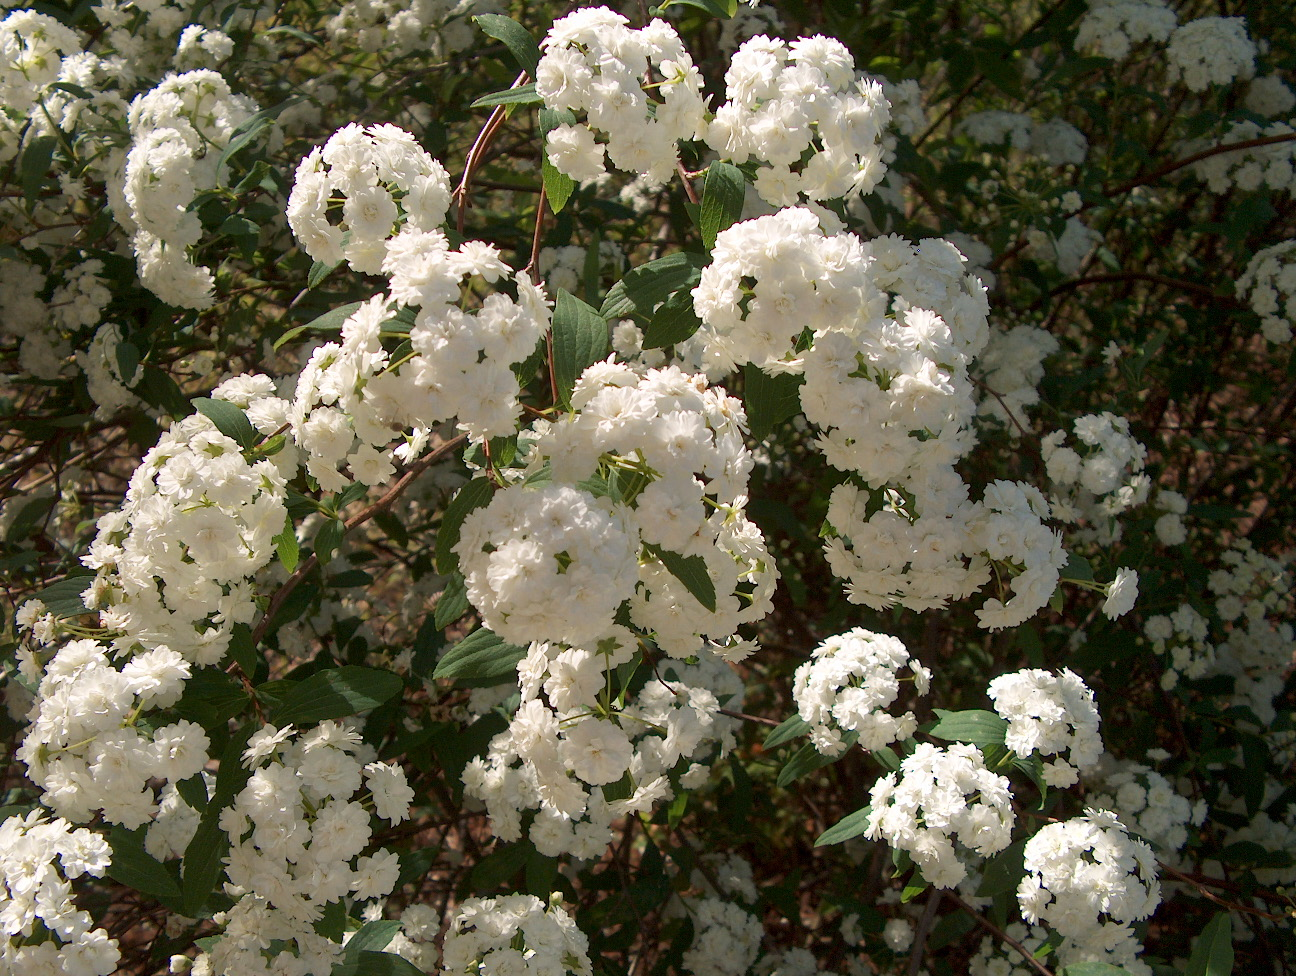 Spiraea cantoniensis / Spiraea cantoniensis